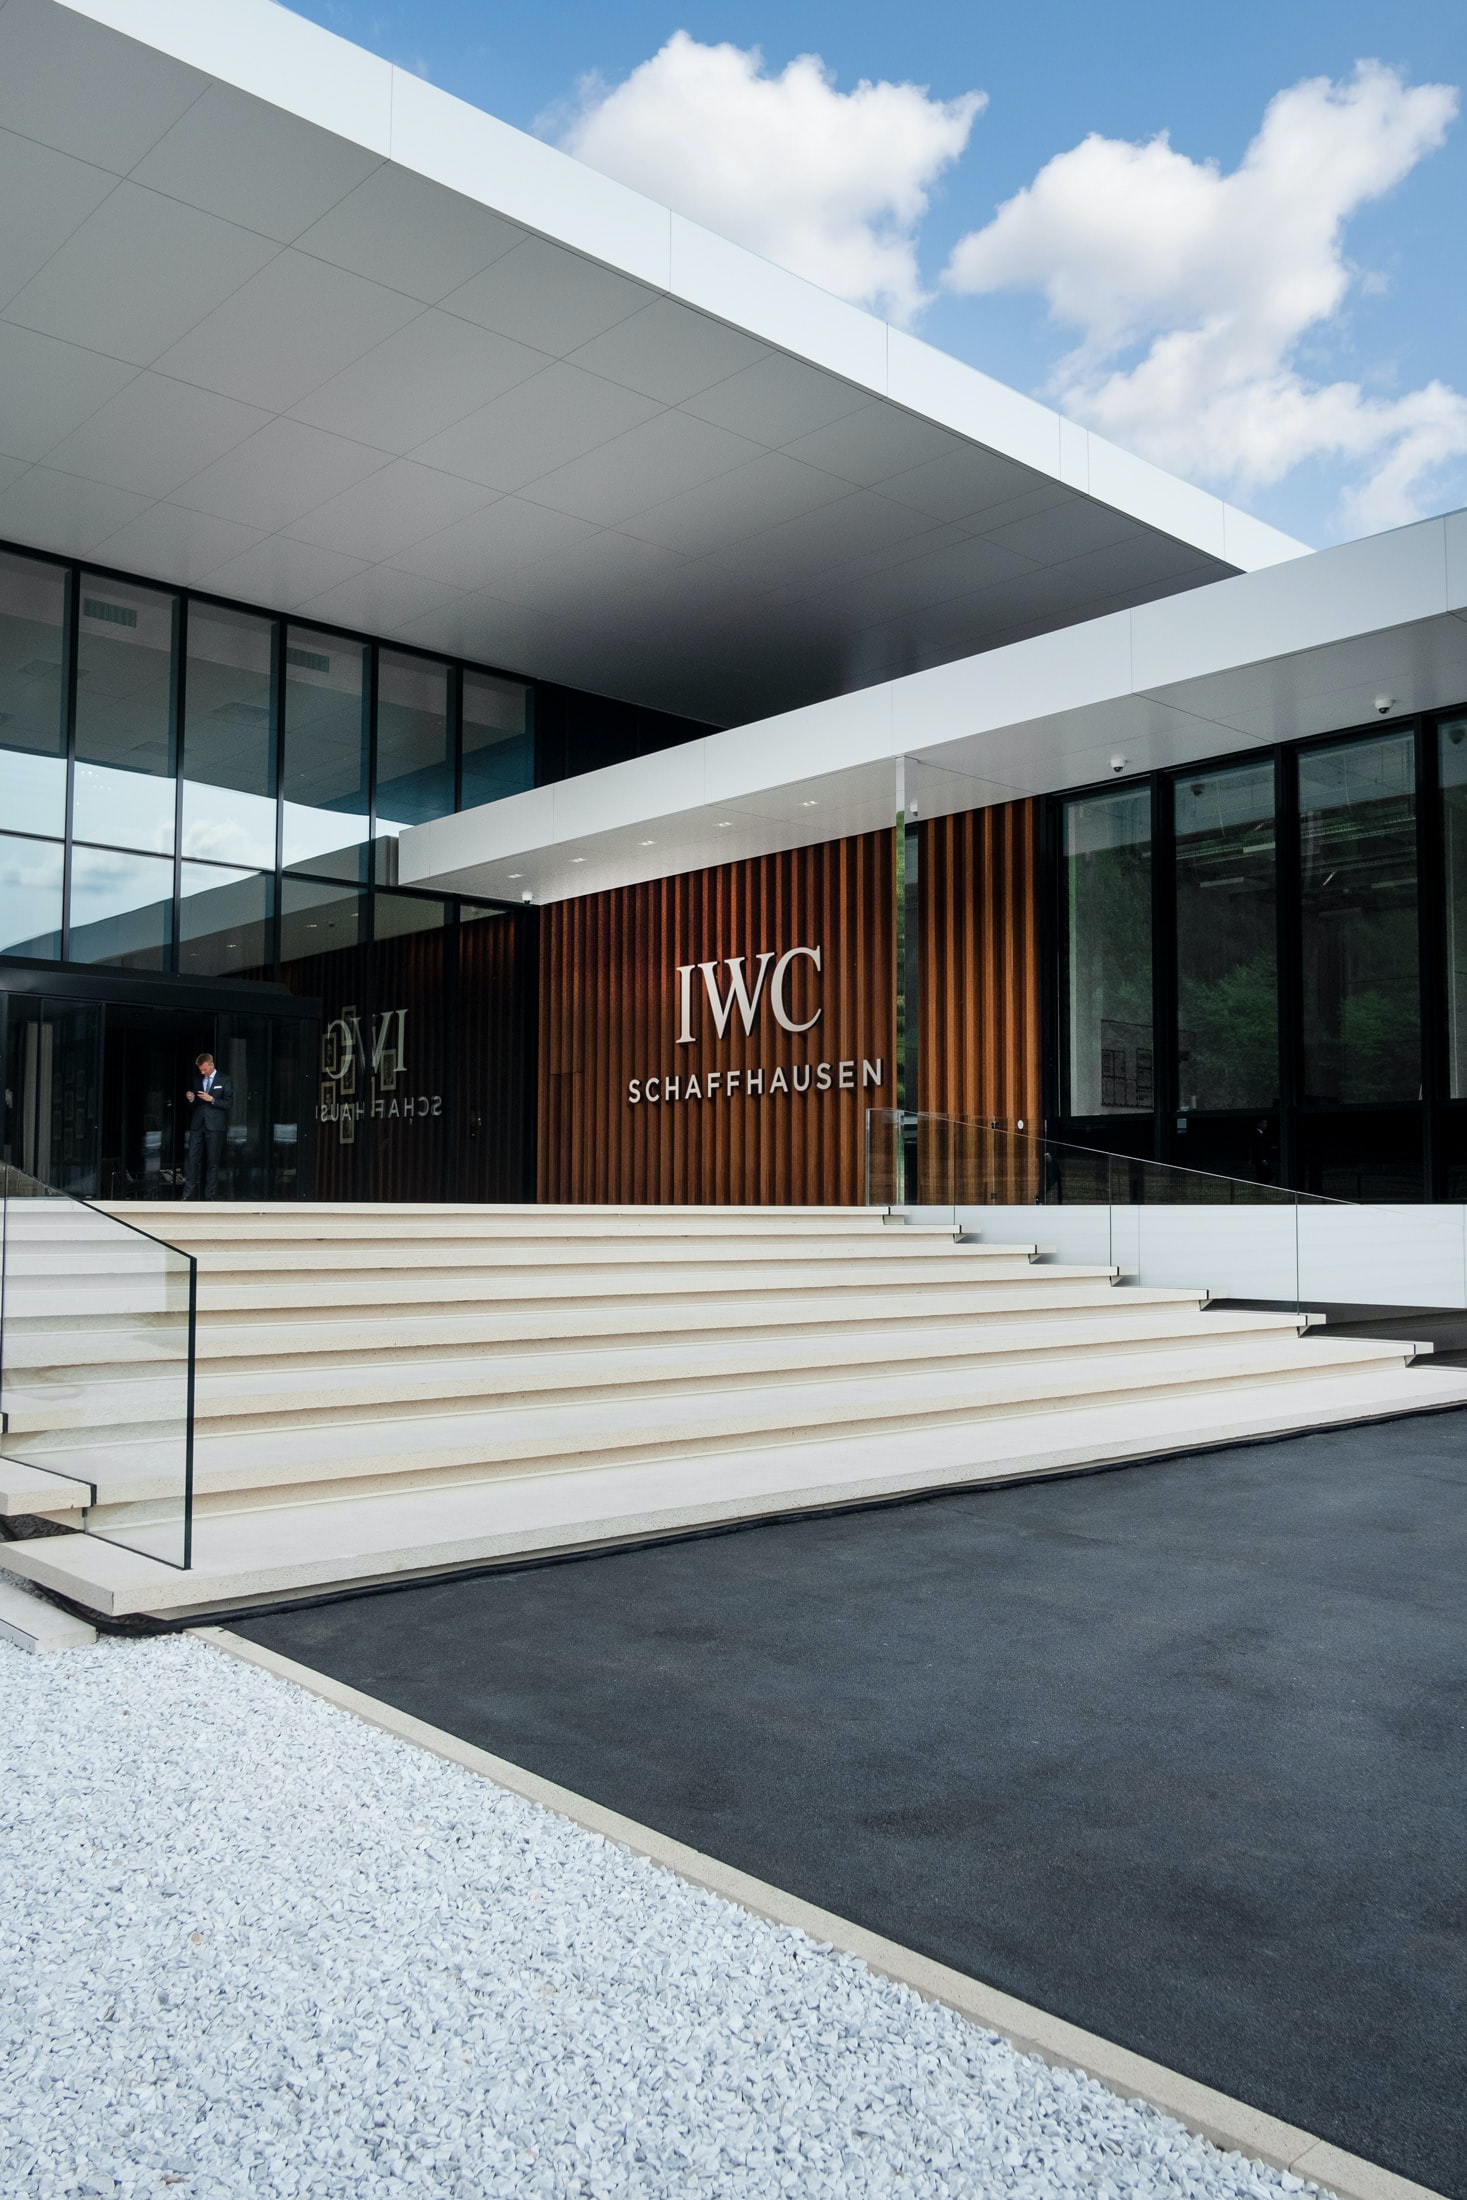 Inside The Manufacture: The New IWC Manufakturzentrum DSCF9296